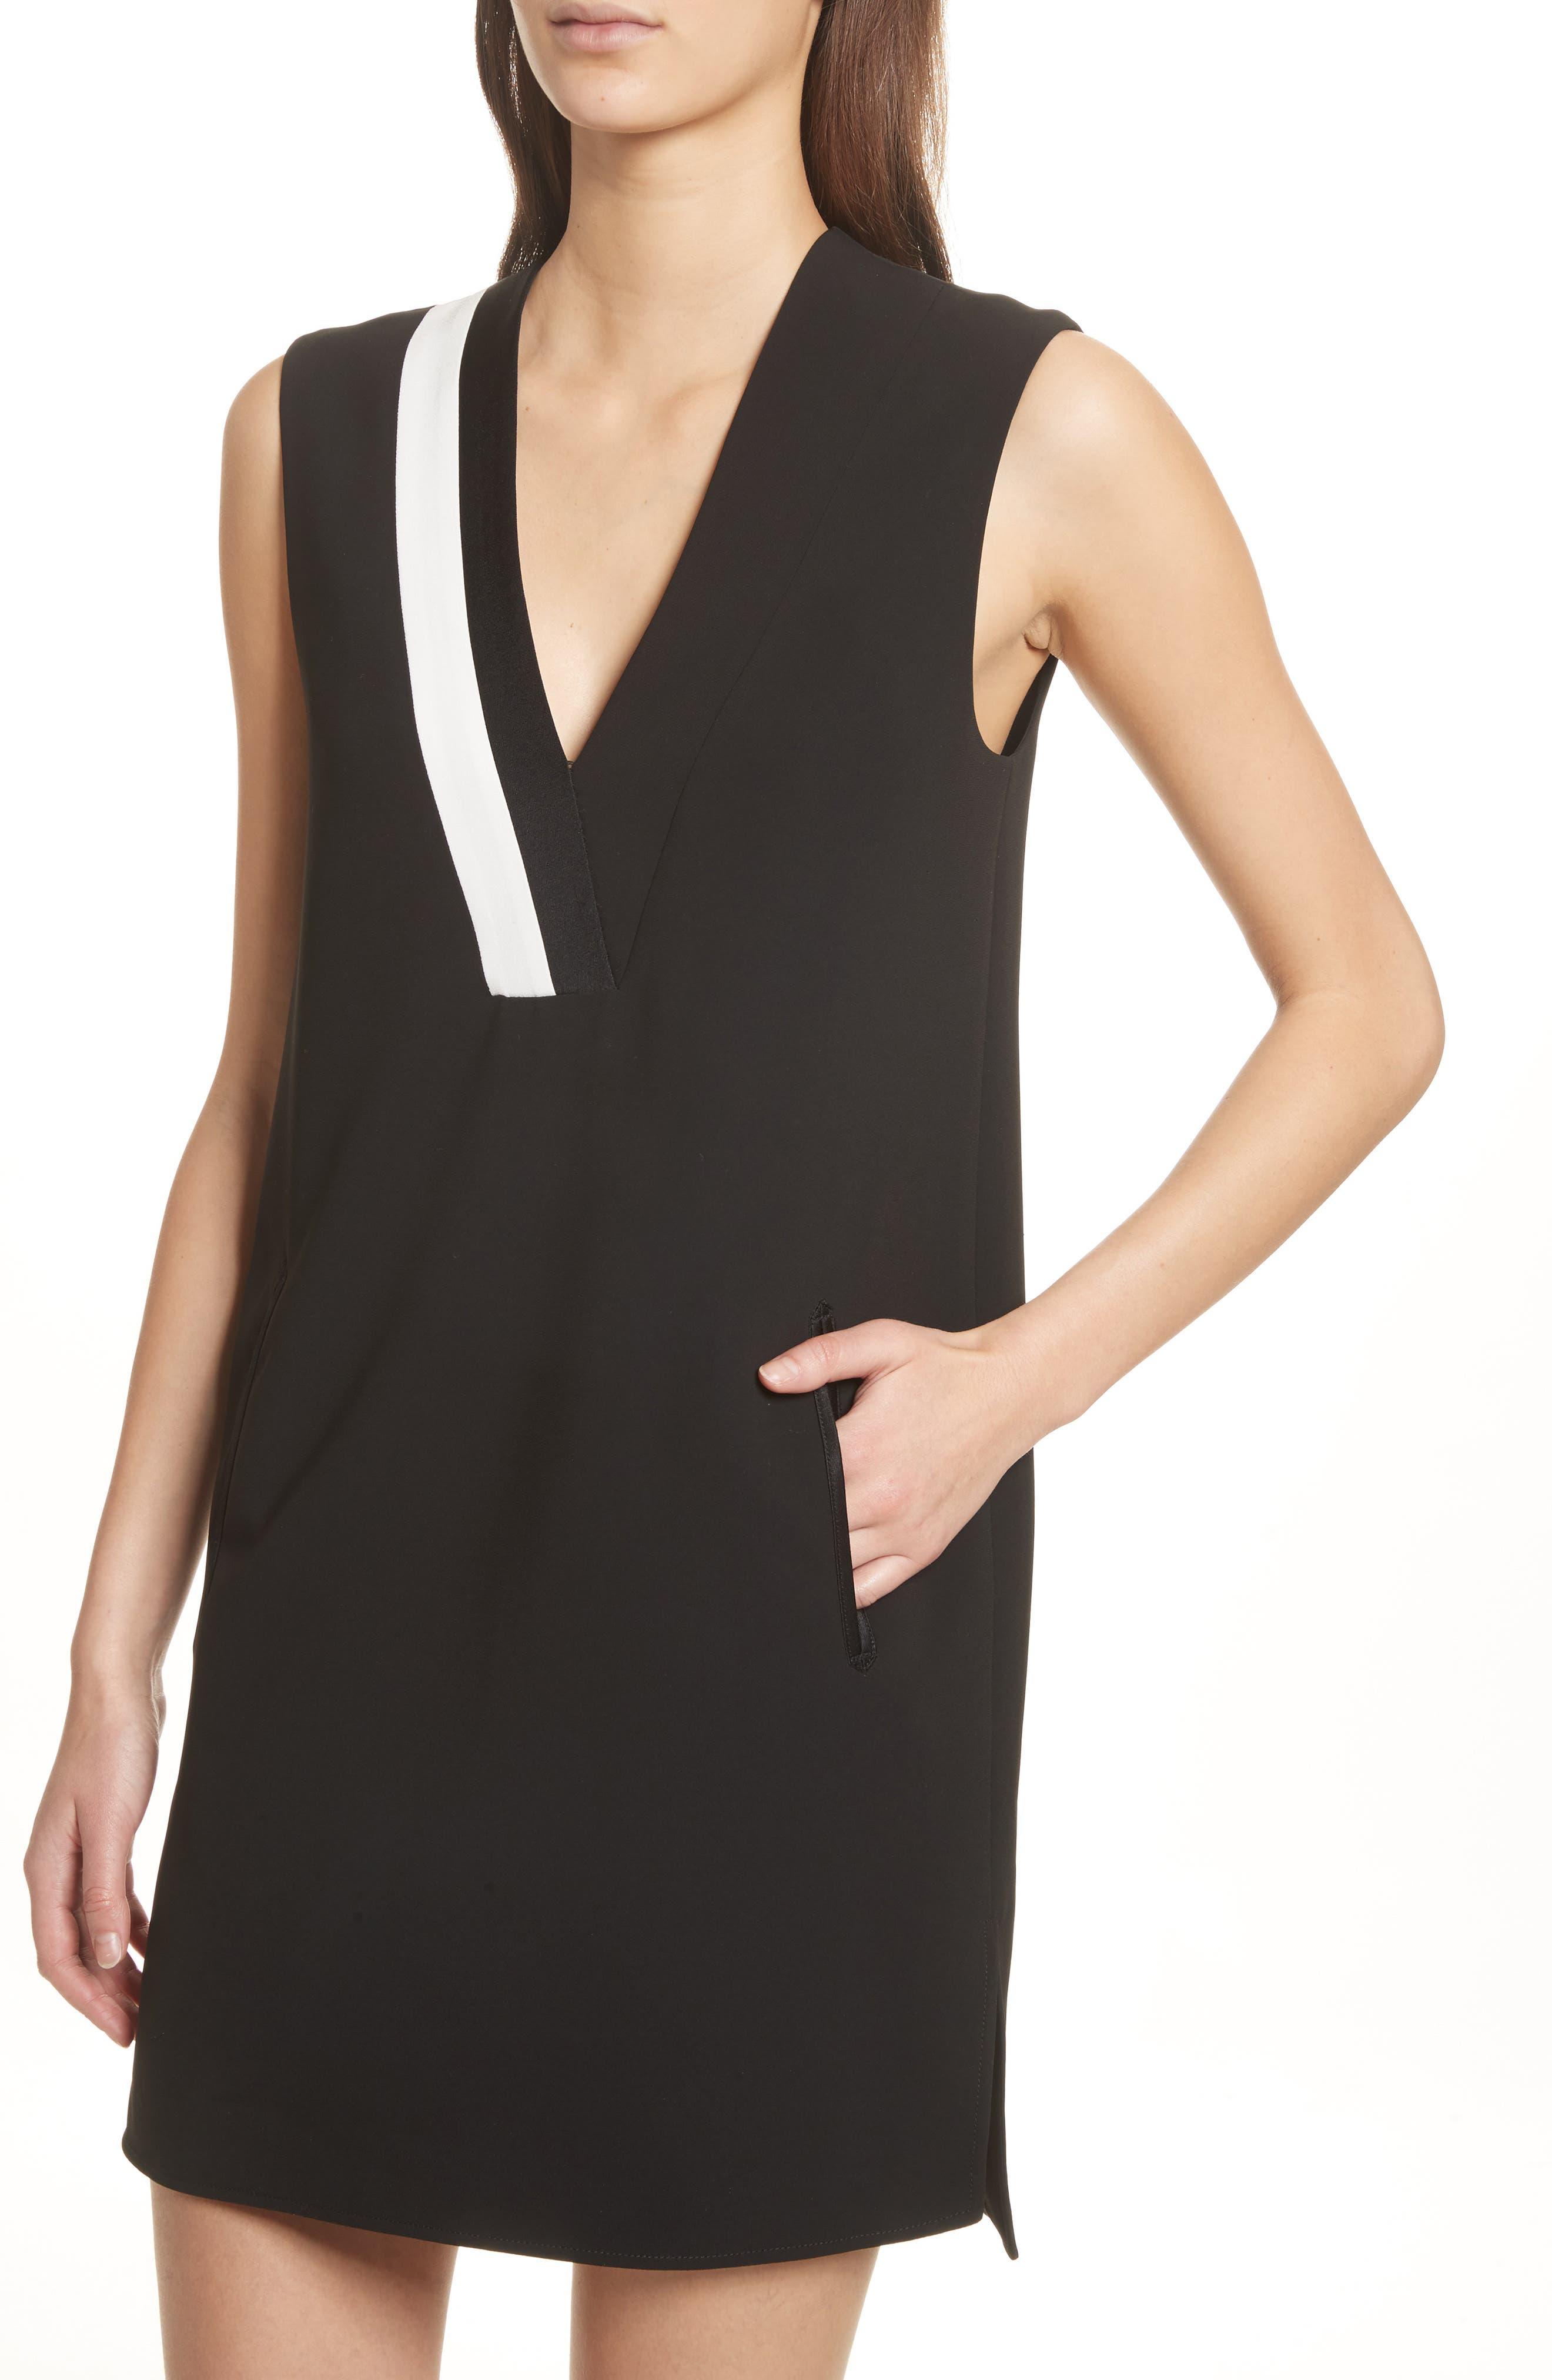 Lodwick Dress,                             Alternate thumbnail 4, color,                             001